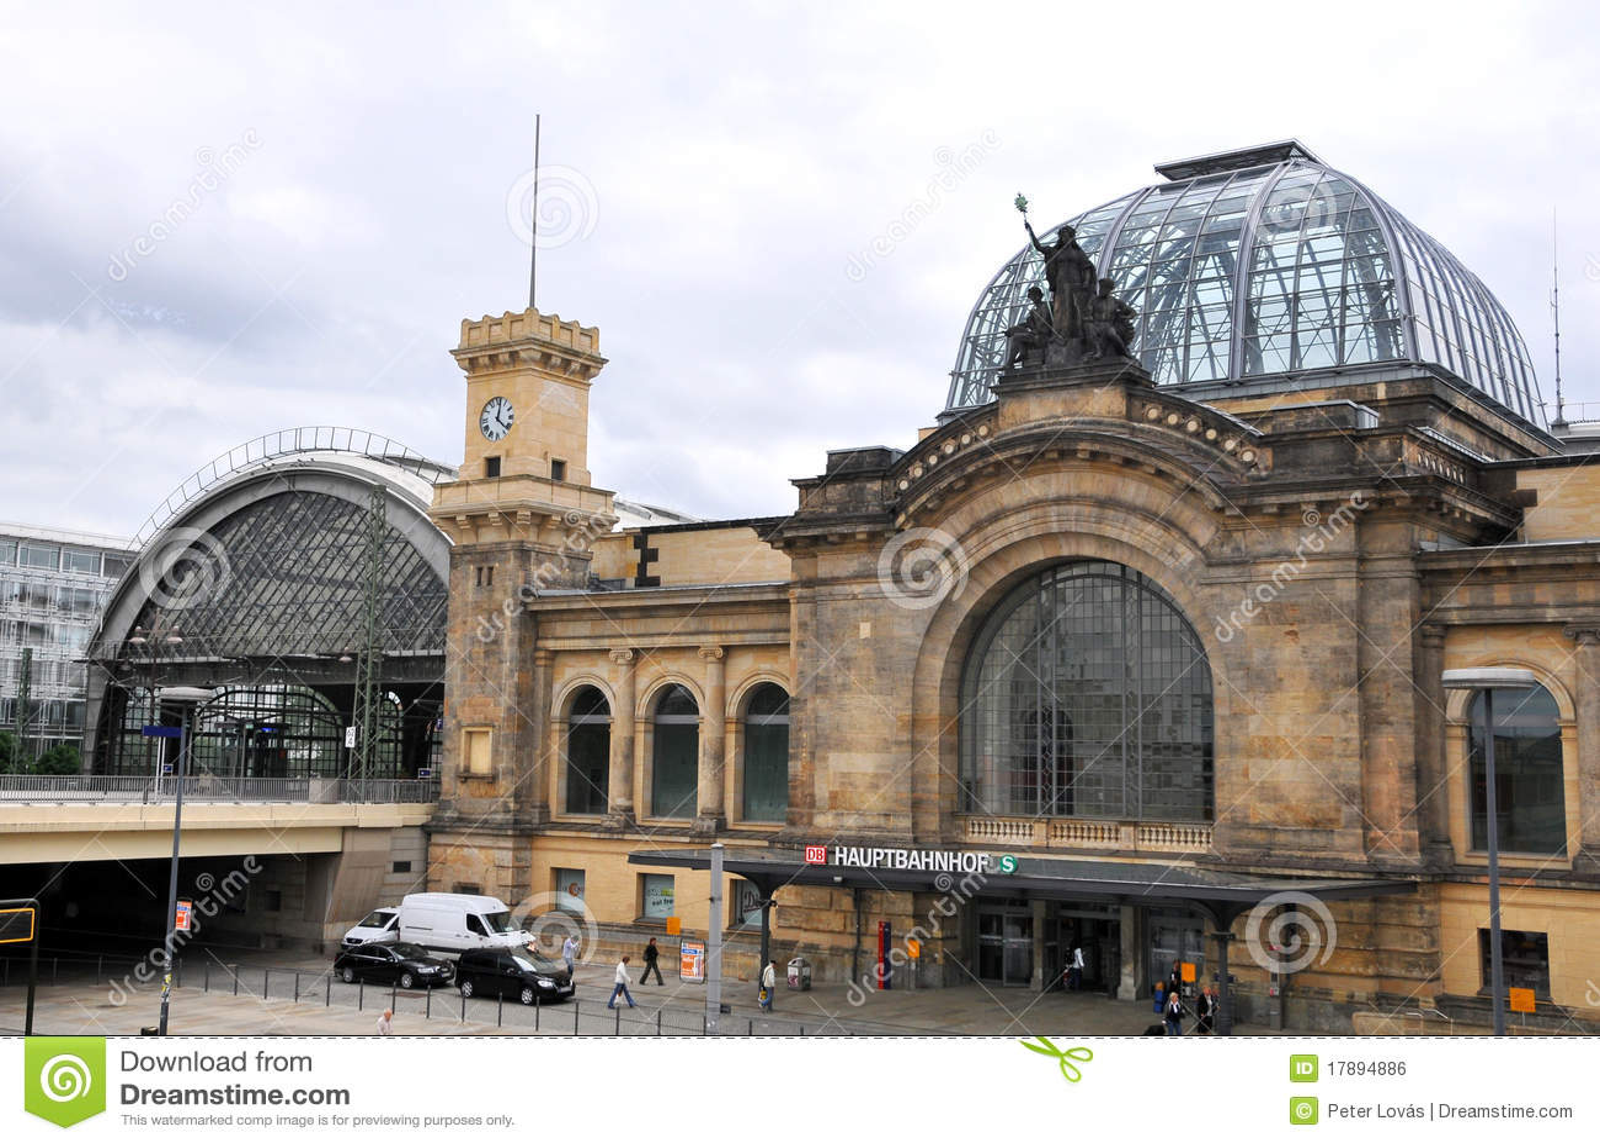 Orion Dresden Hauptbahnhof